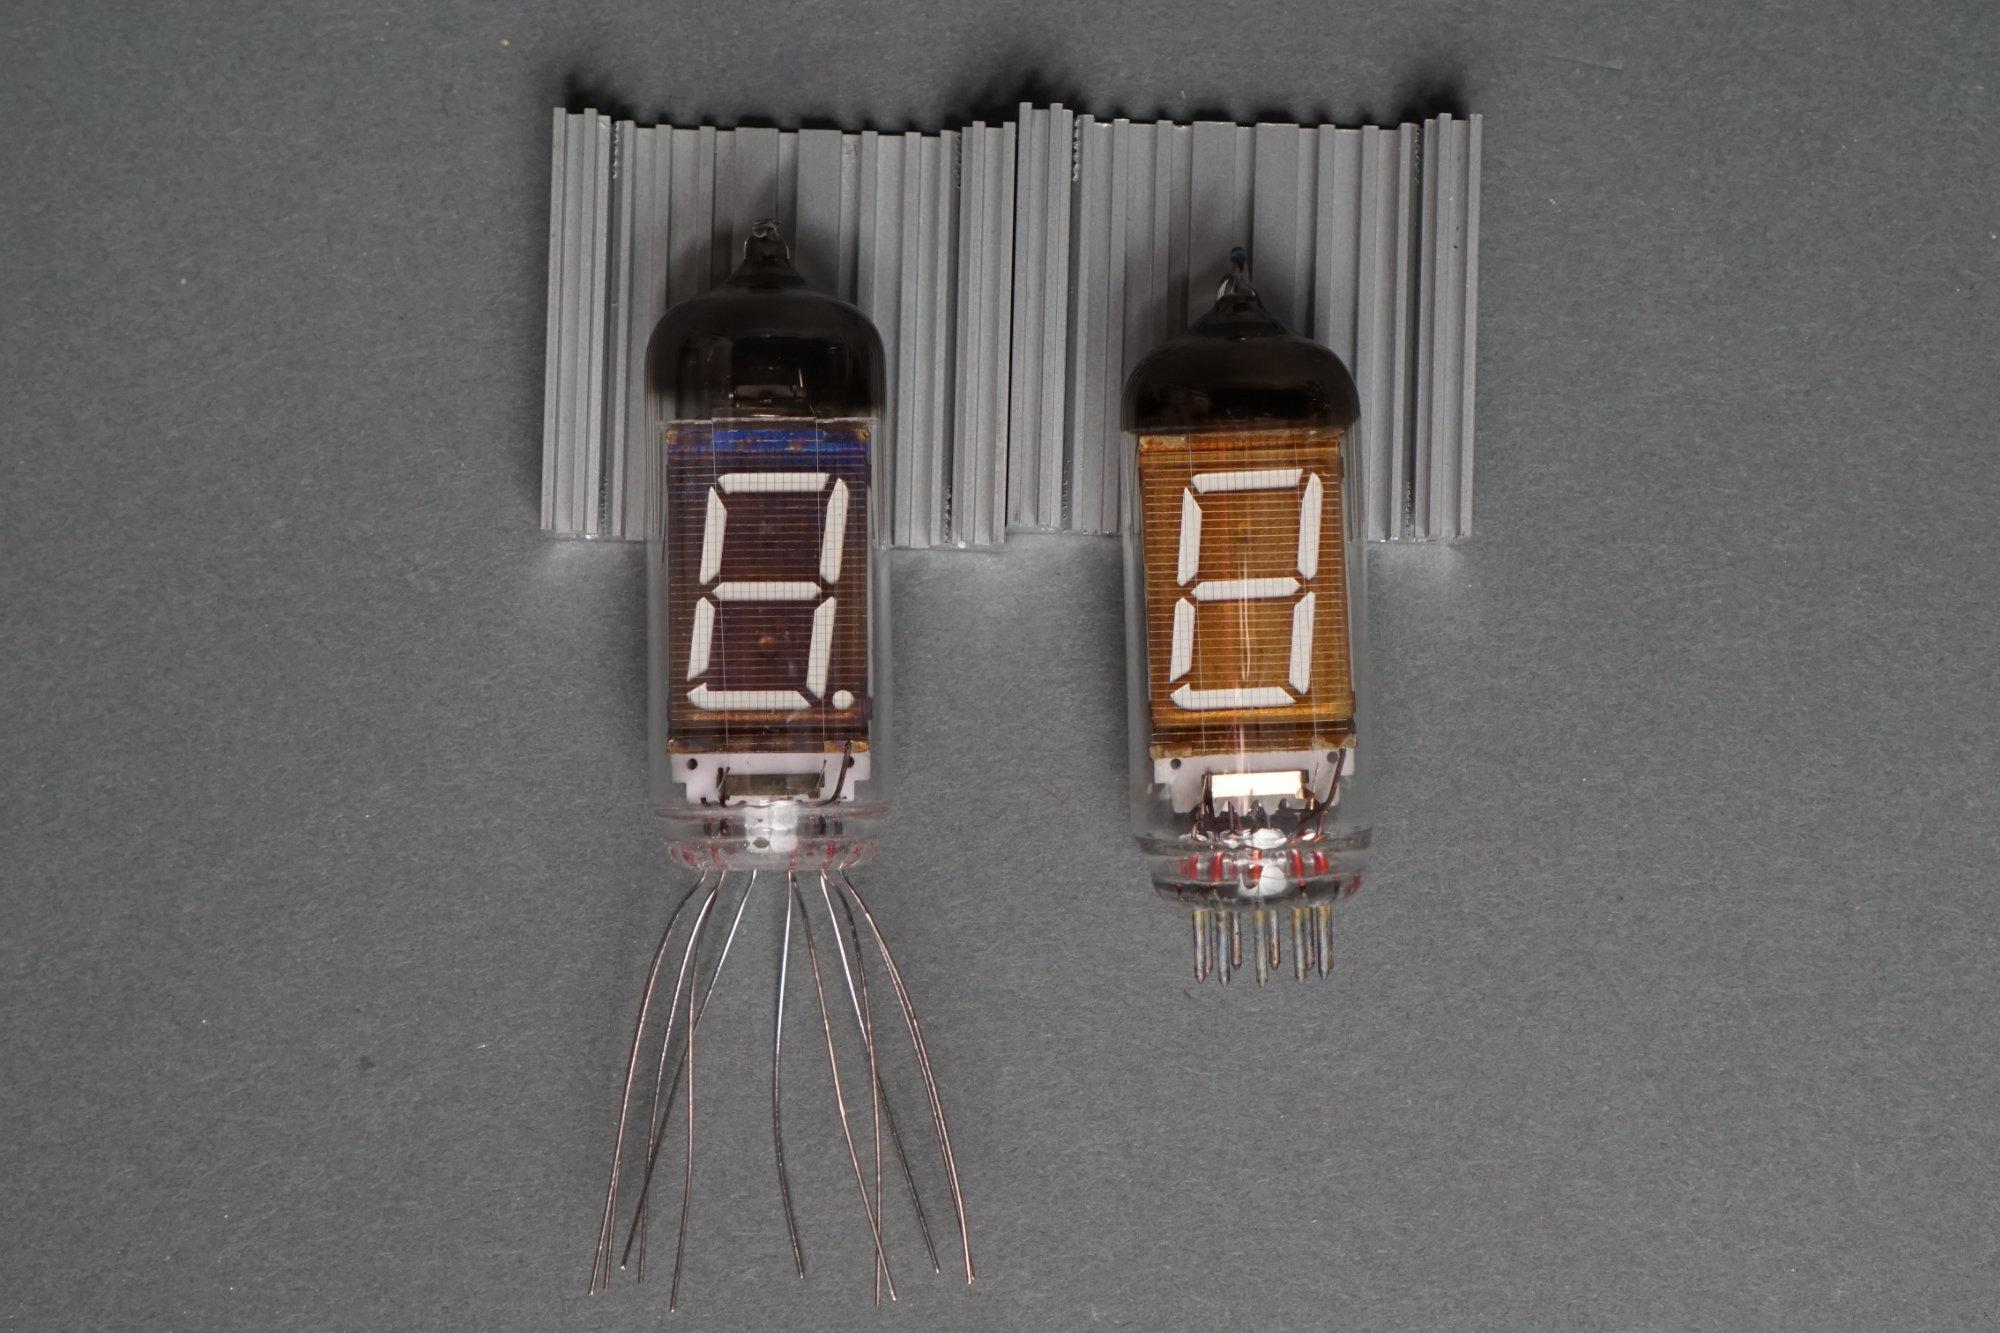 IV-11 VFD Vintage Clock Assembled Assembled Ready to Use Version 2017